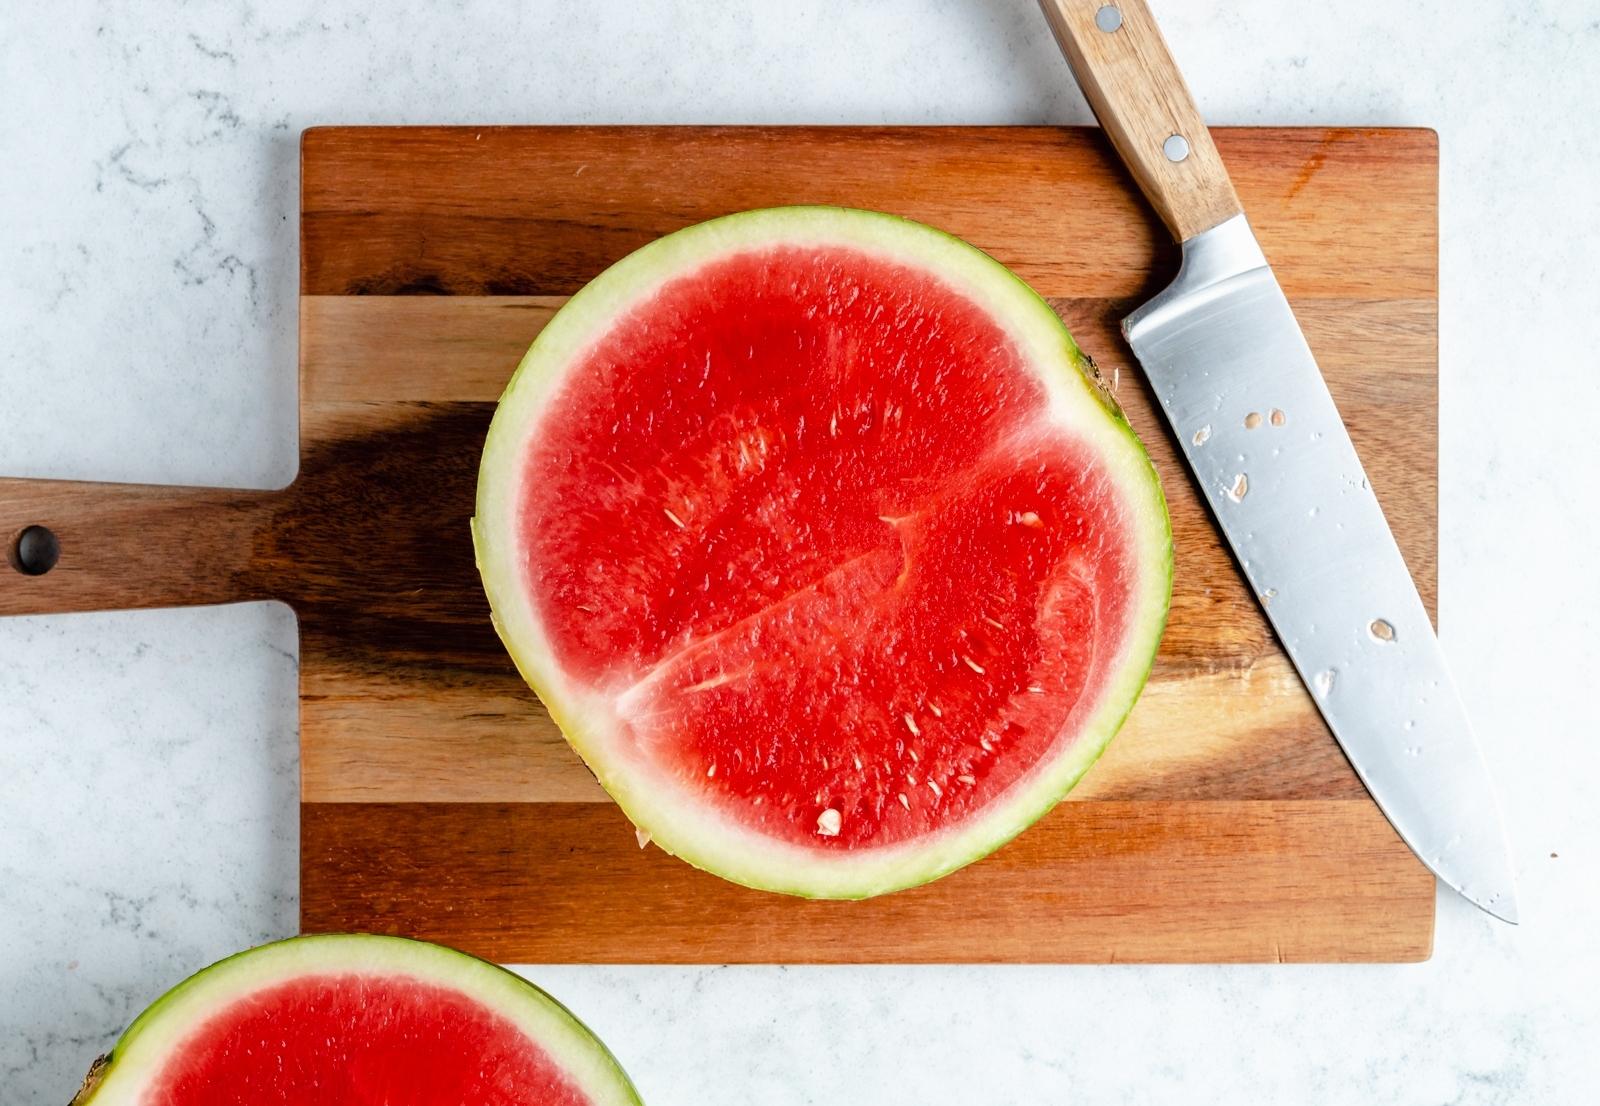 half of a watermelon on a cutting board flesh-side up